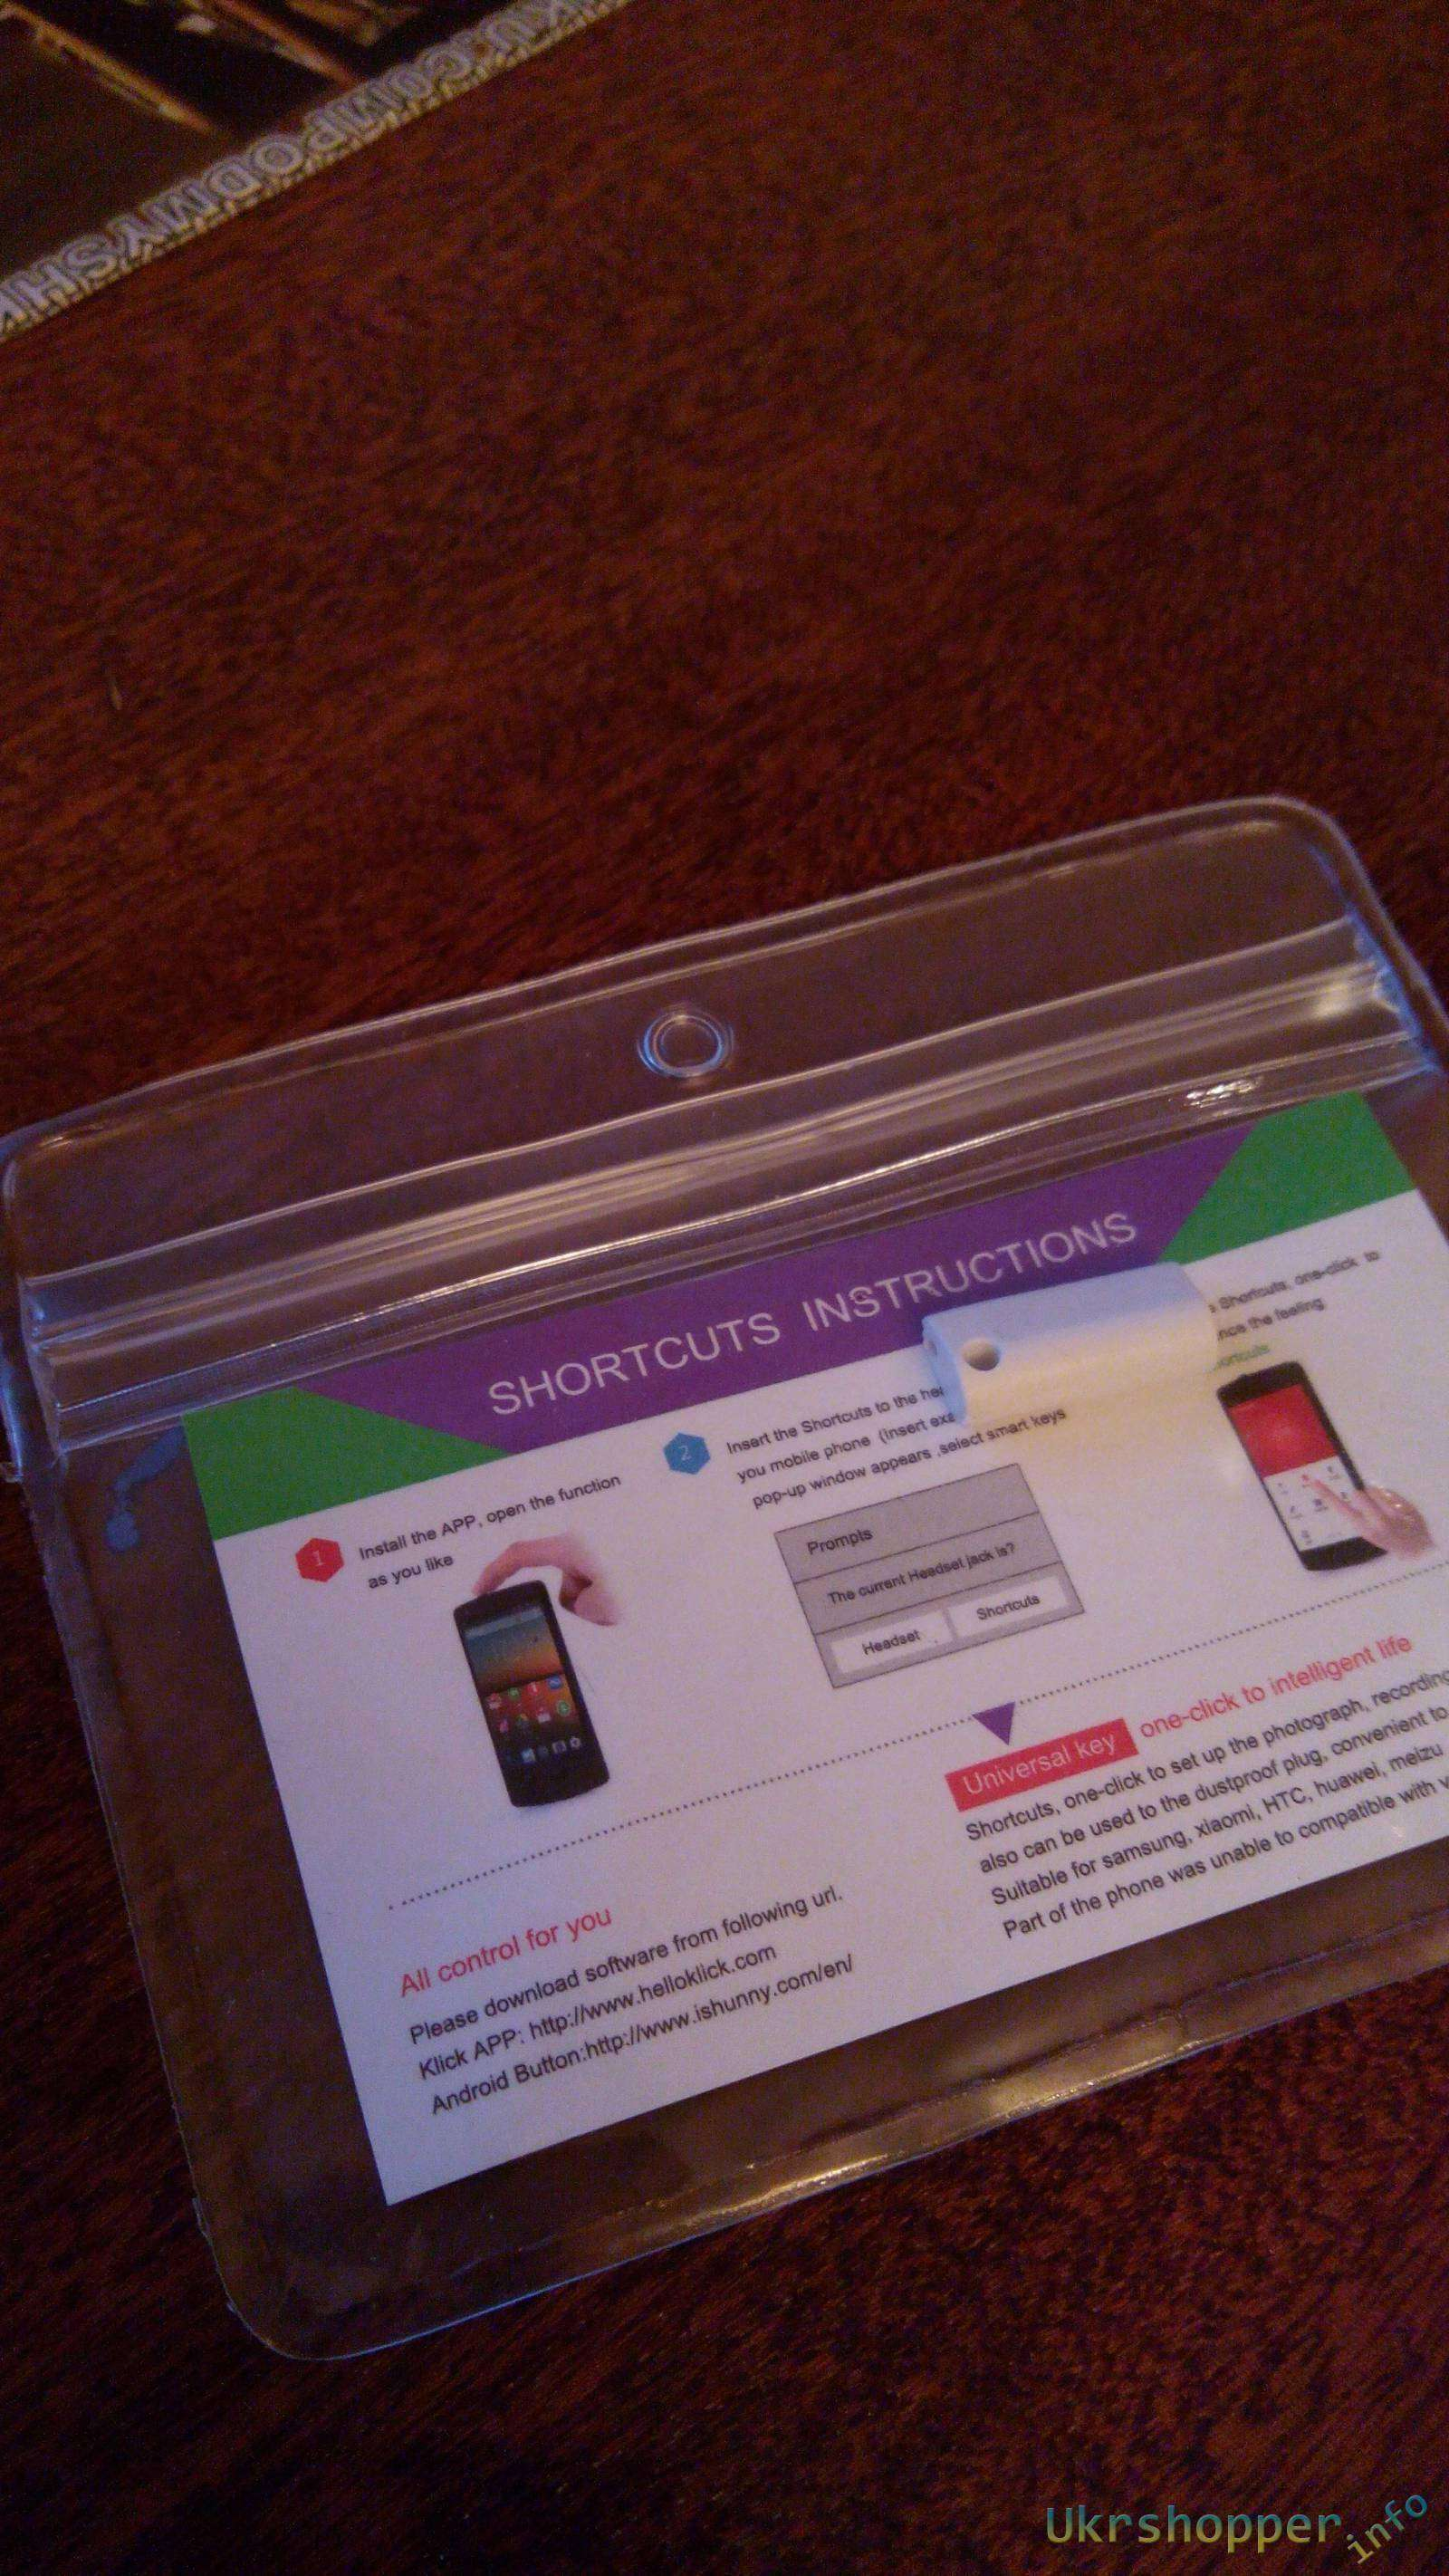 GearBest: Кнопка для смартфона KlicK + коротенькое видео